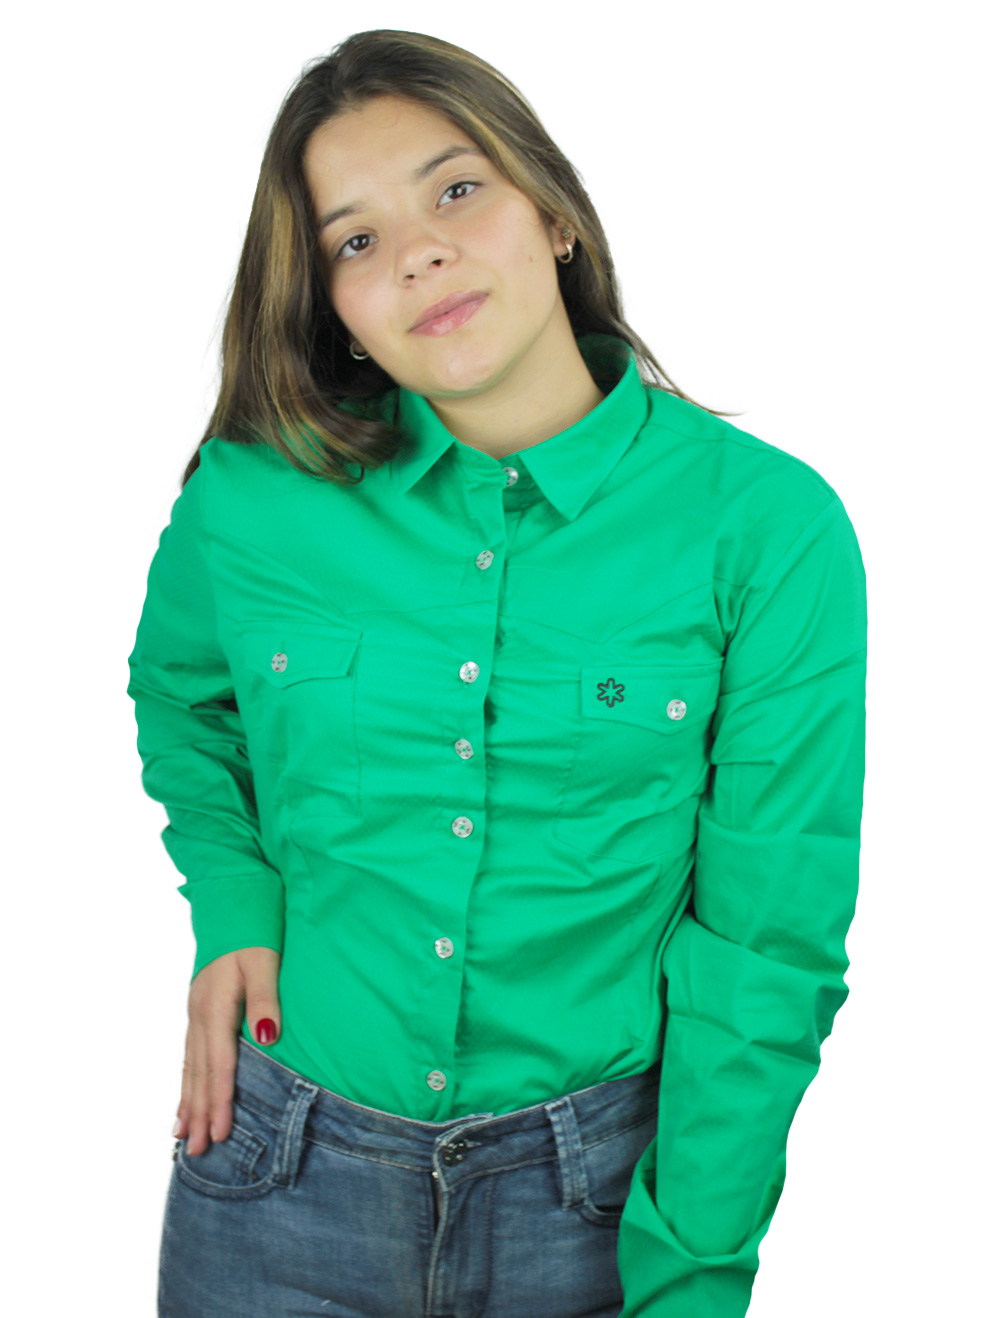 Camisa Feminina Manga Longa Lisa Verde Bandeira Bordado Preto